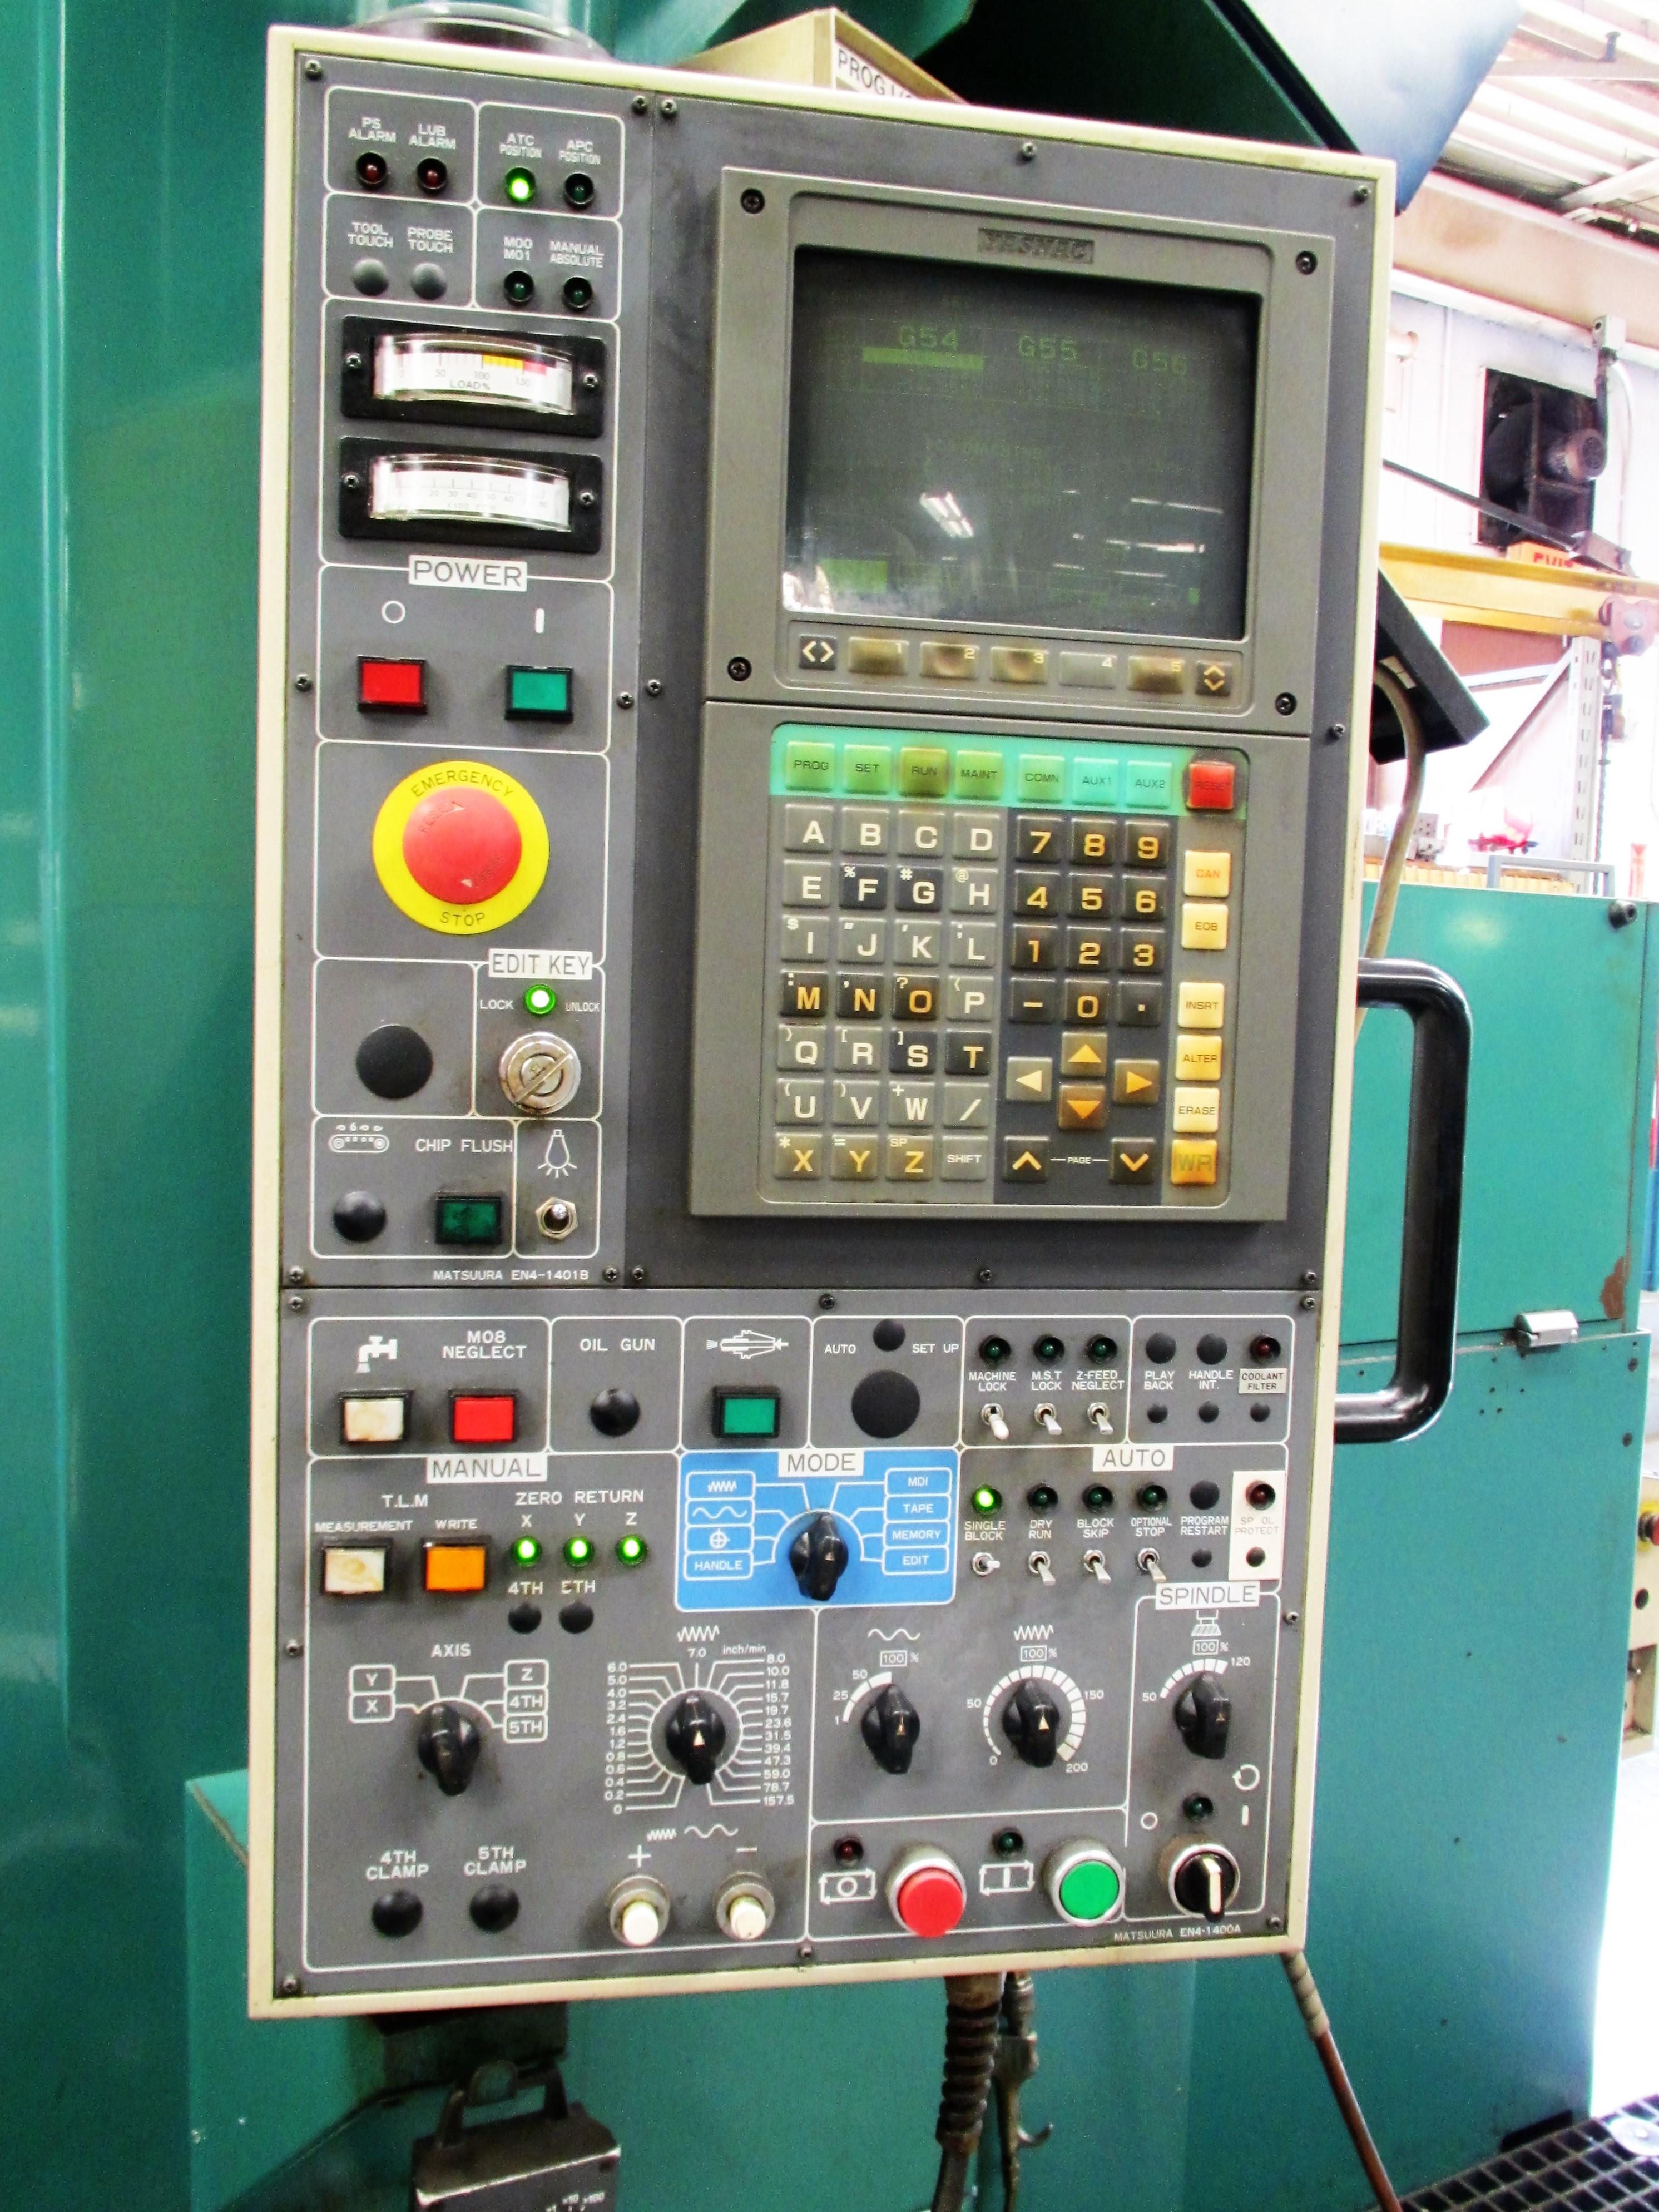 MATSUURA RA-4F CNC VERTICAL MACHINING CENTER WITH APC - Image 2 of 12